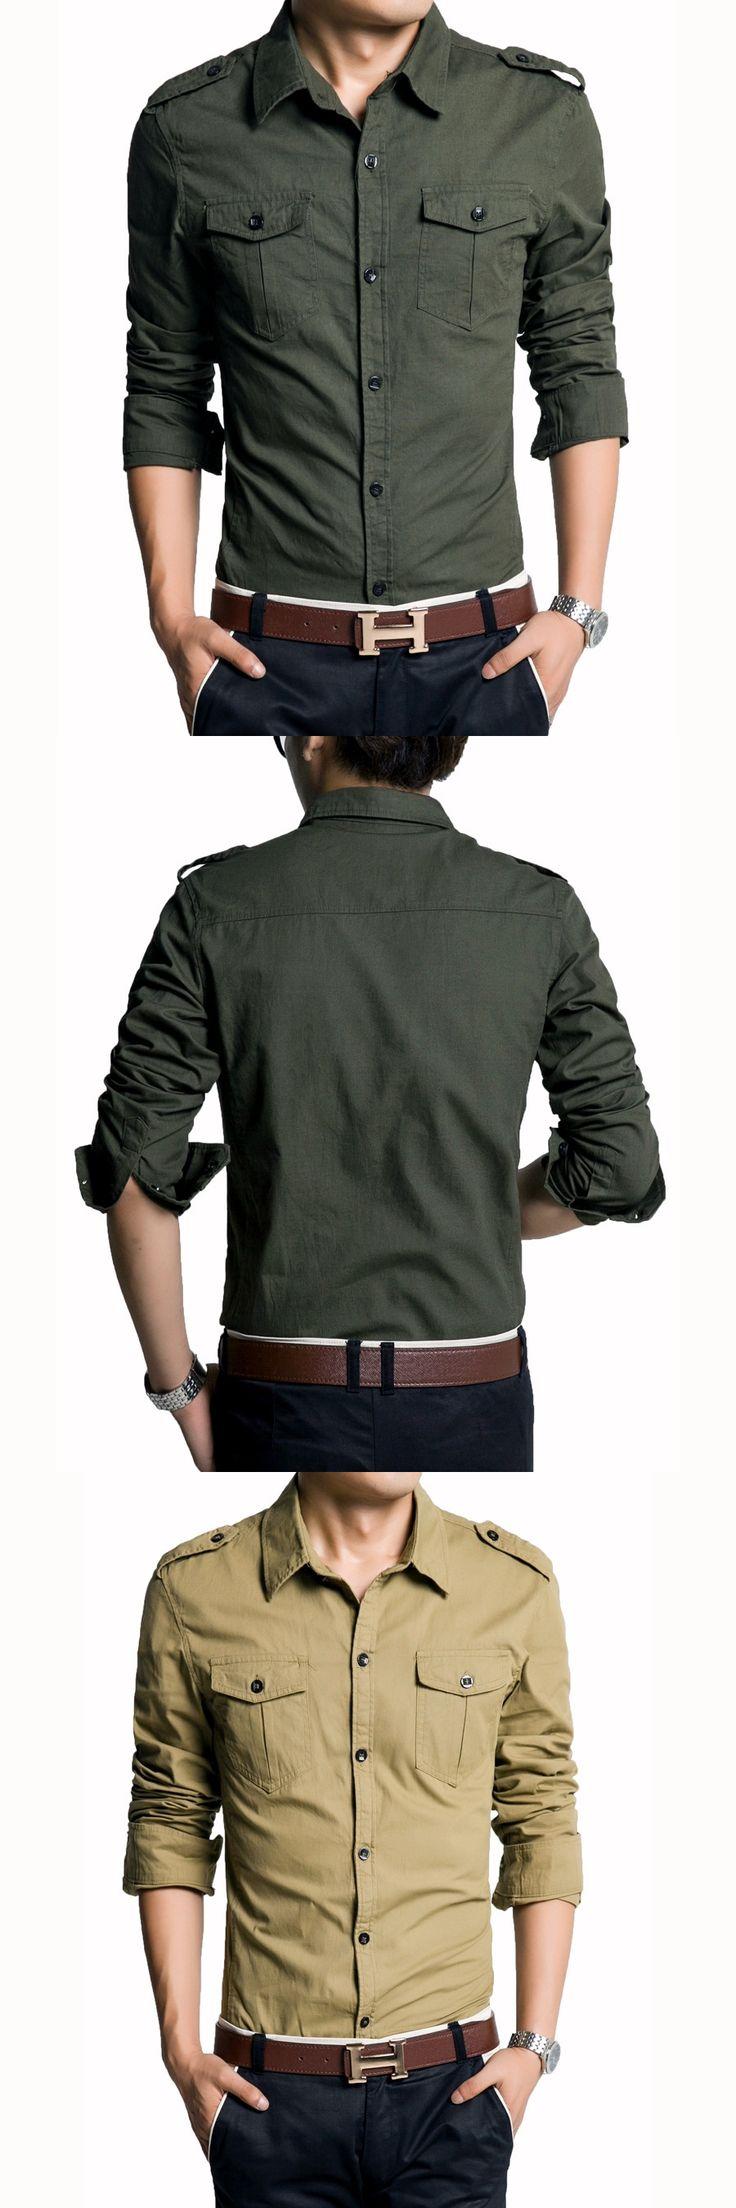 New 2016 Men's Shirt Long Sleeve Military Style Shirts Double Pocket Slim Fit Casual Dress Shirts Men Clothing Brand Shirts